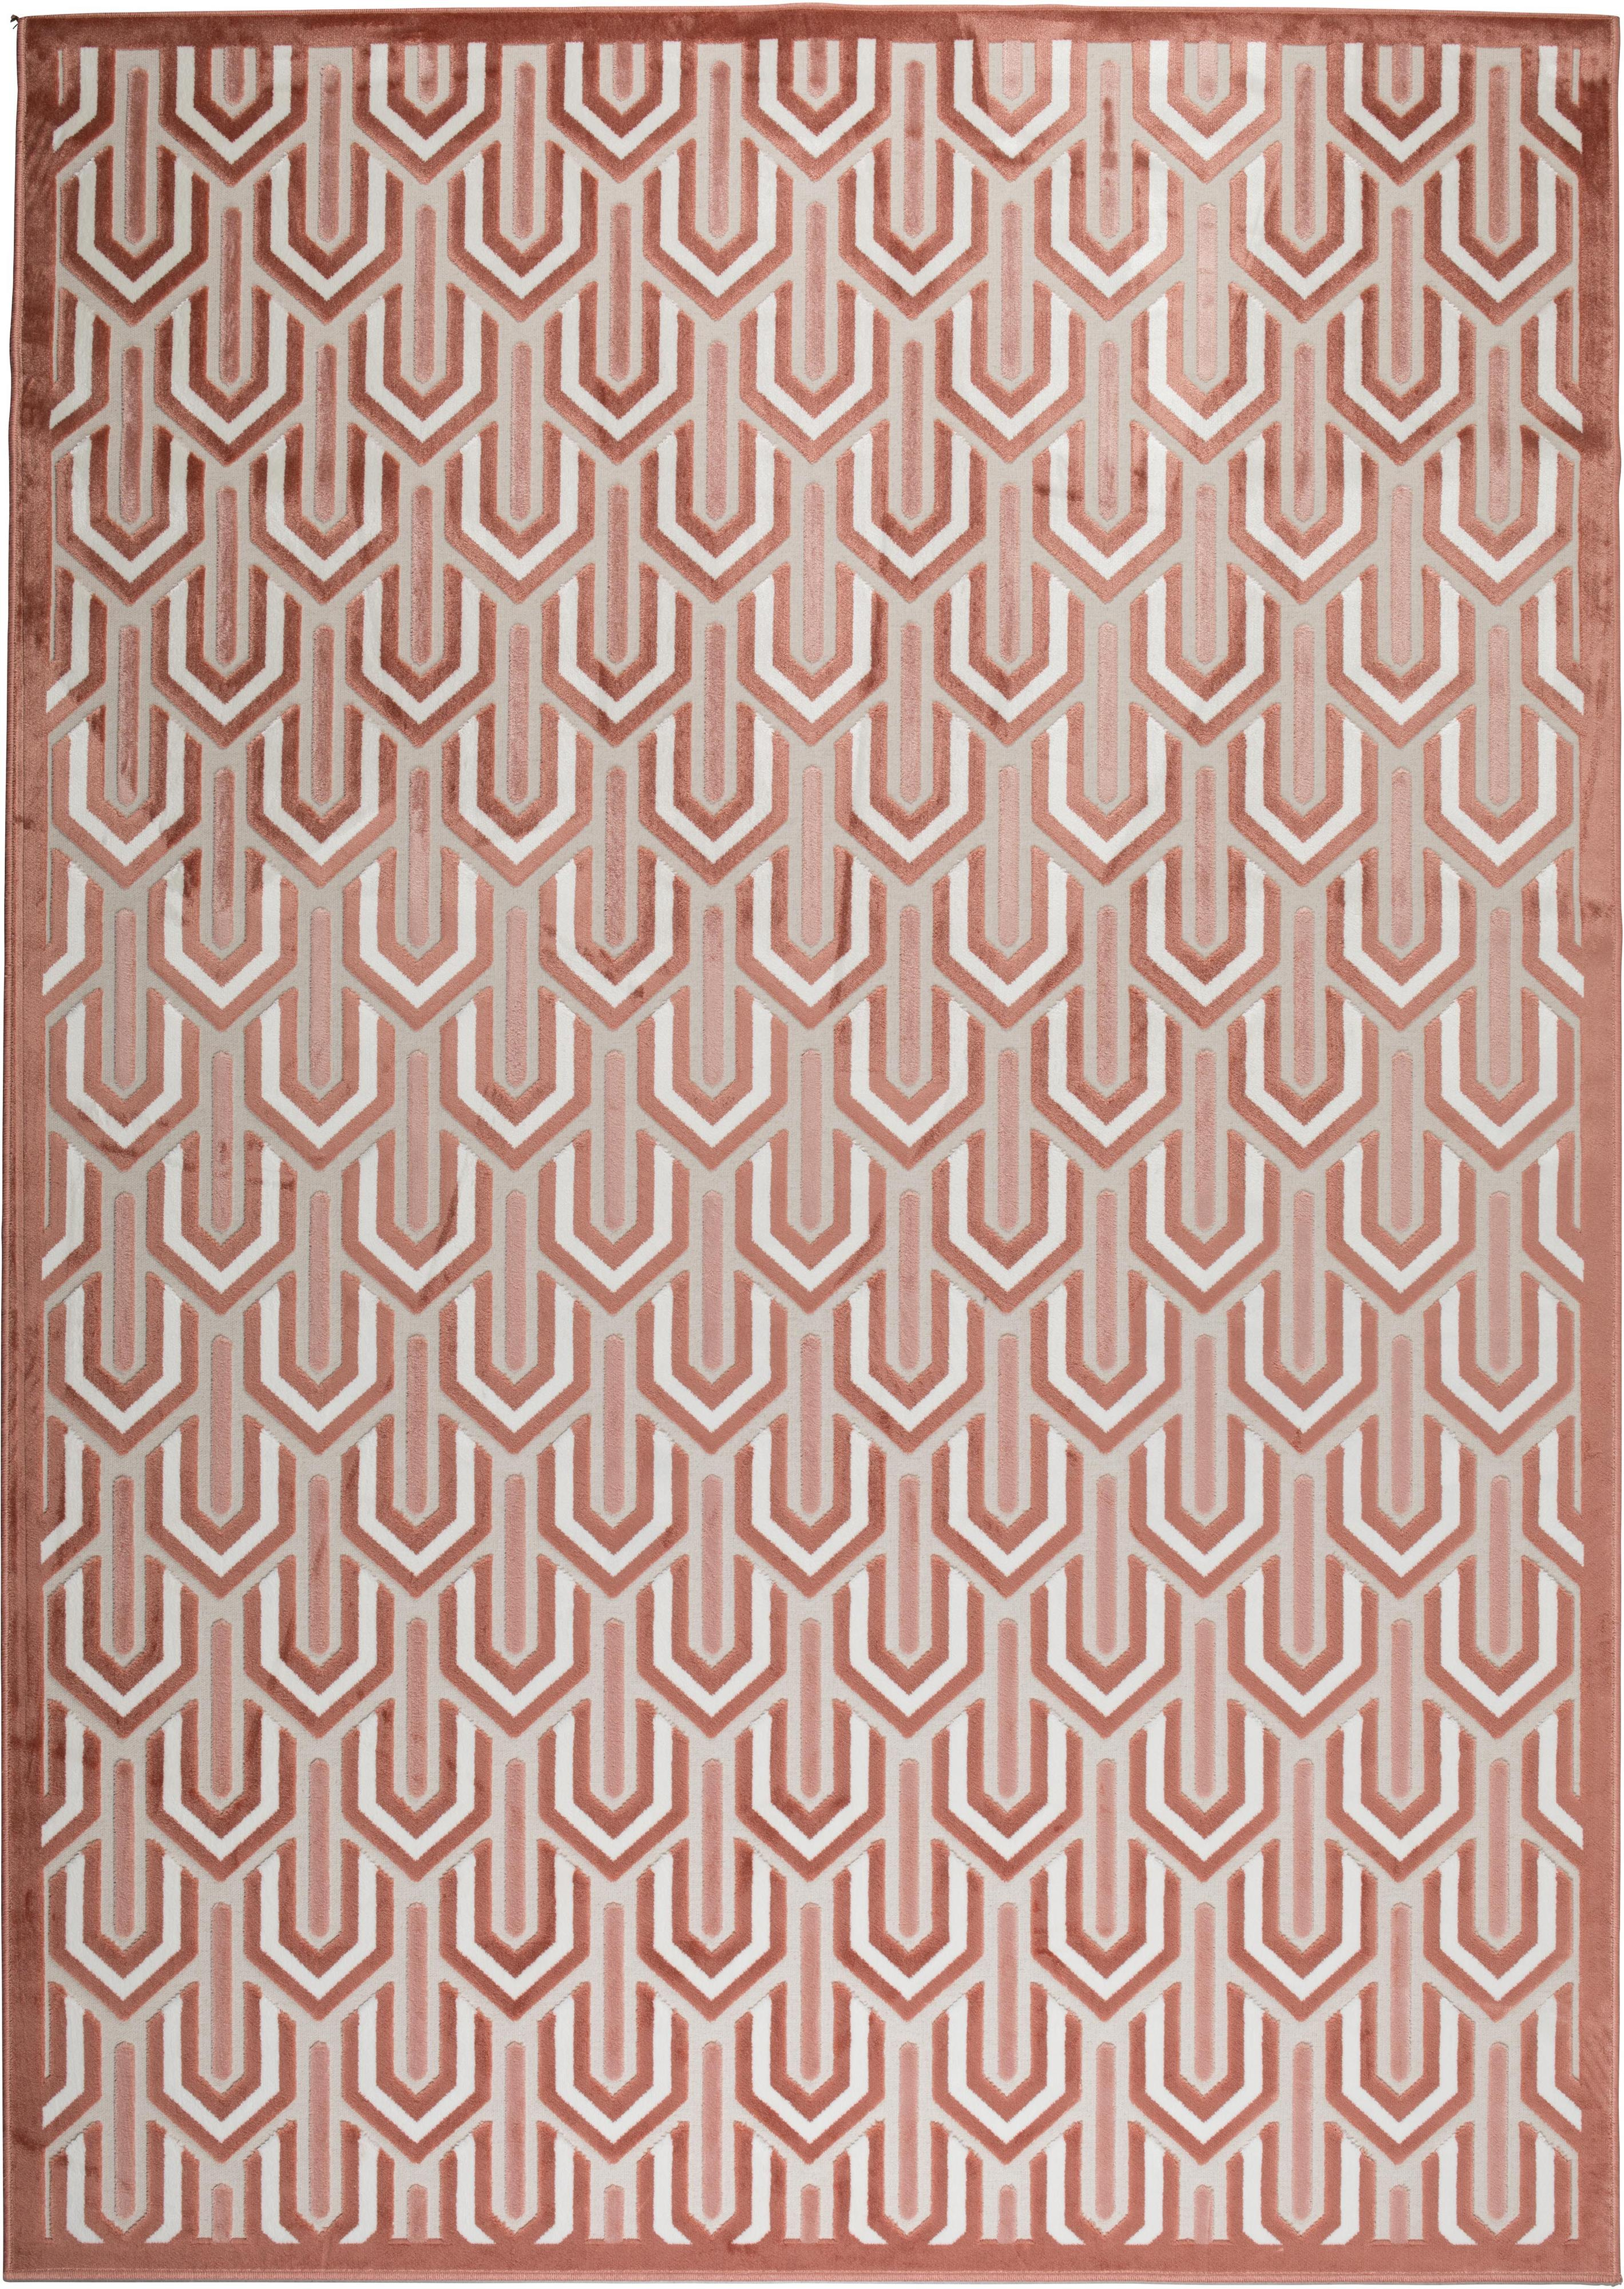 Teppich Beverly mit Hoch-Tief-Struktur, Flor: 57% Rayon, 31% Polyester,, Rosa, Altrosa, Hellbeige, B 170 x L 240 cm (Grösse M)